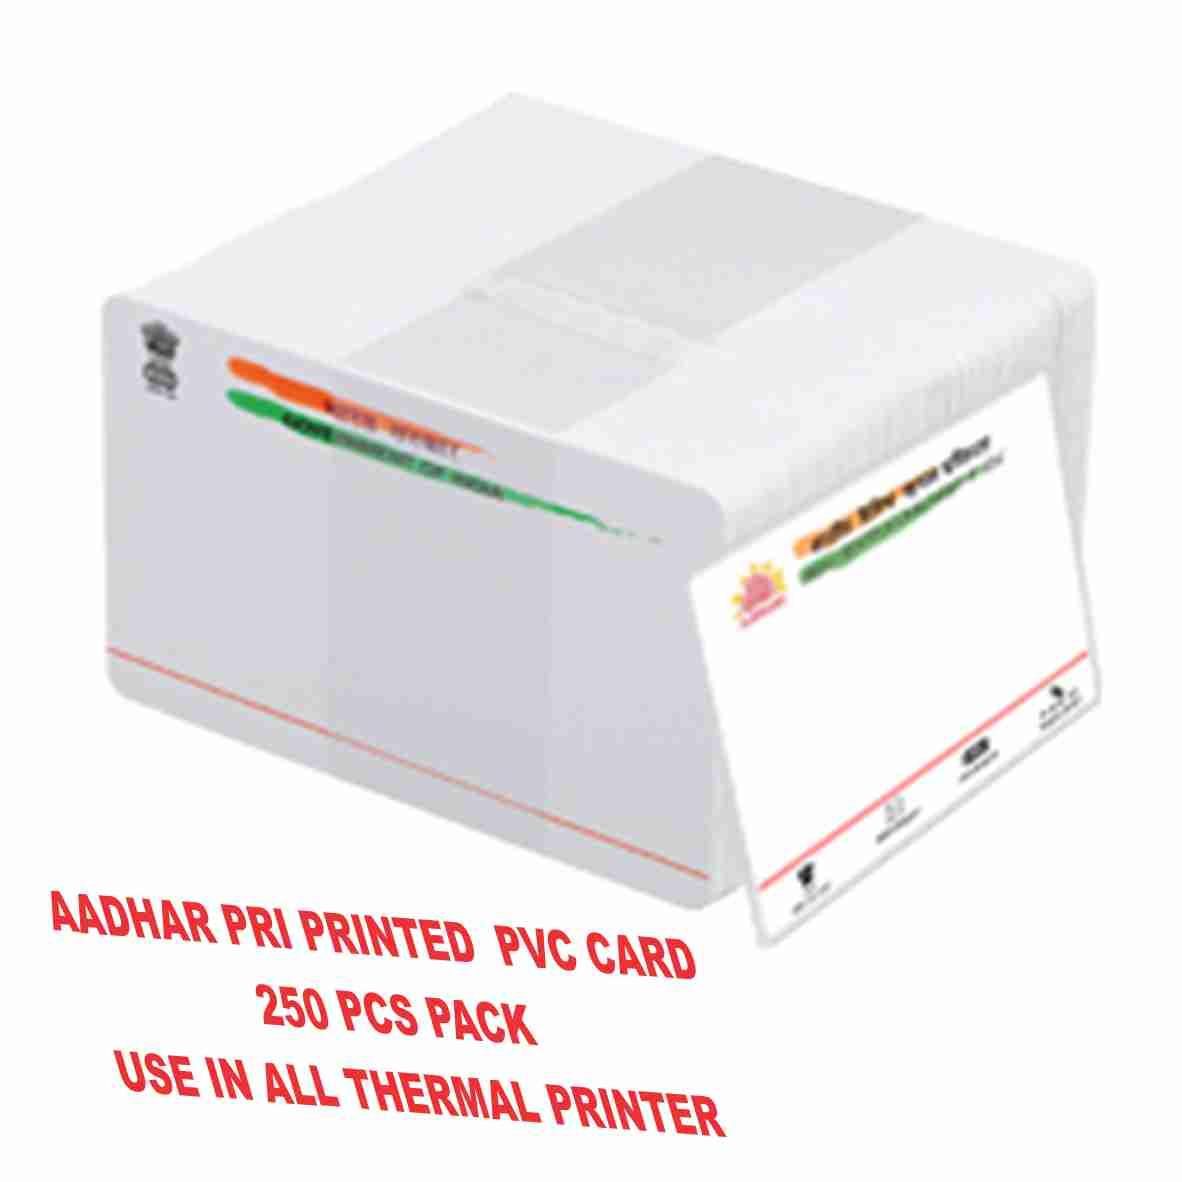 DDS AADHHAR ID Pre - Printed PVC CARD For Thermal Printers 250pcs